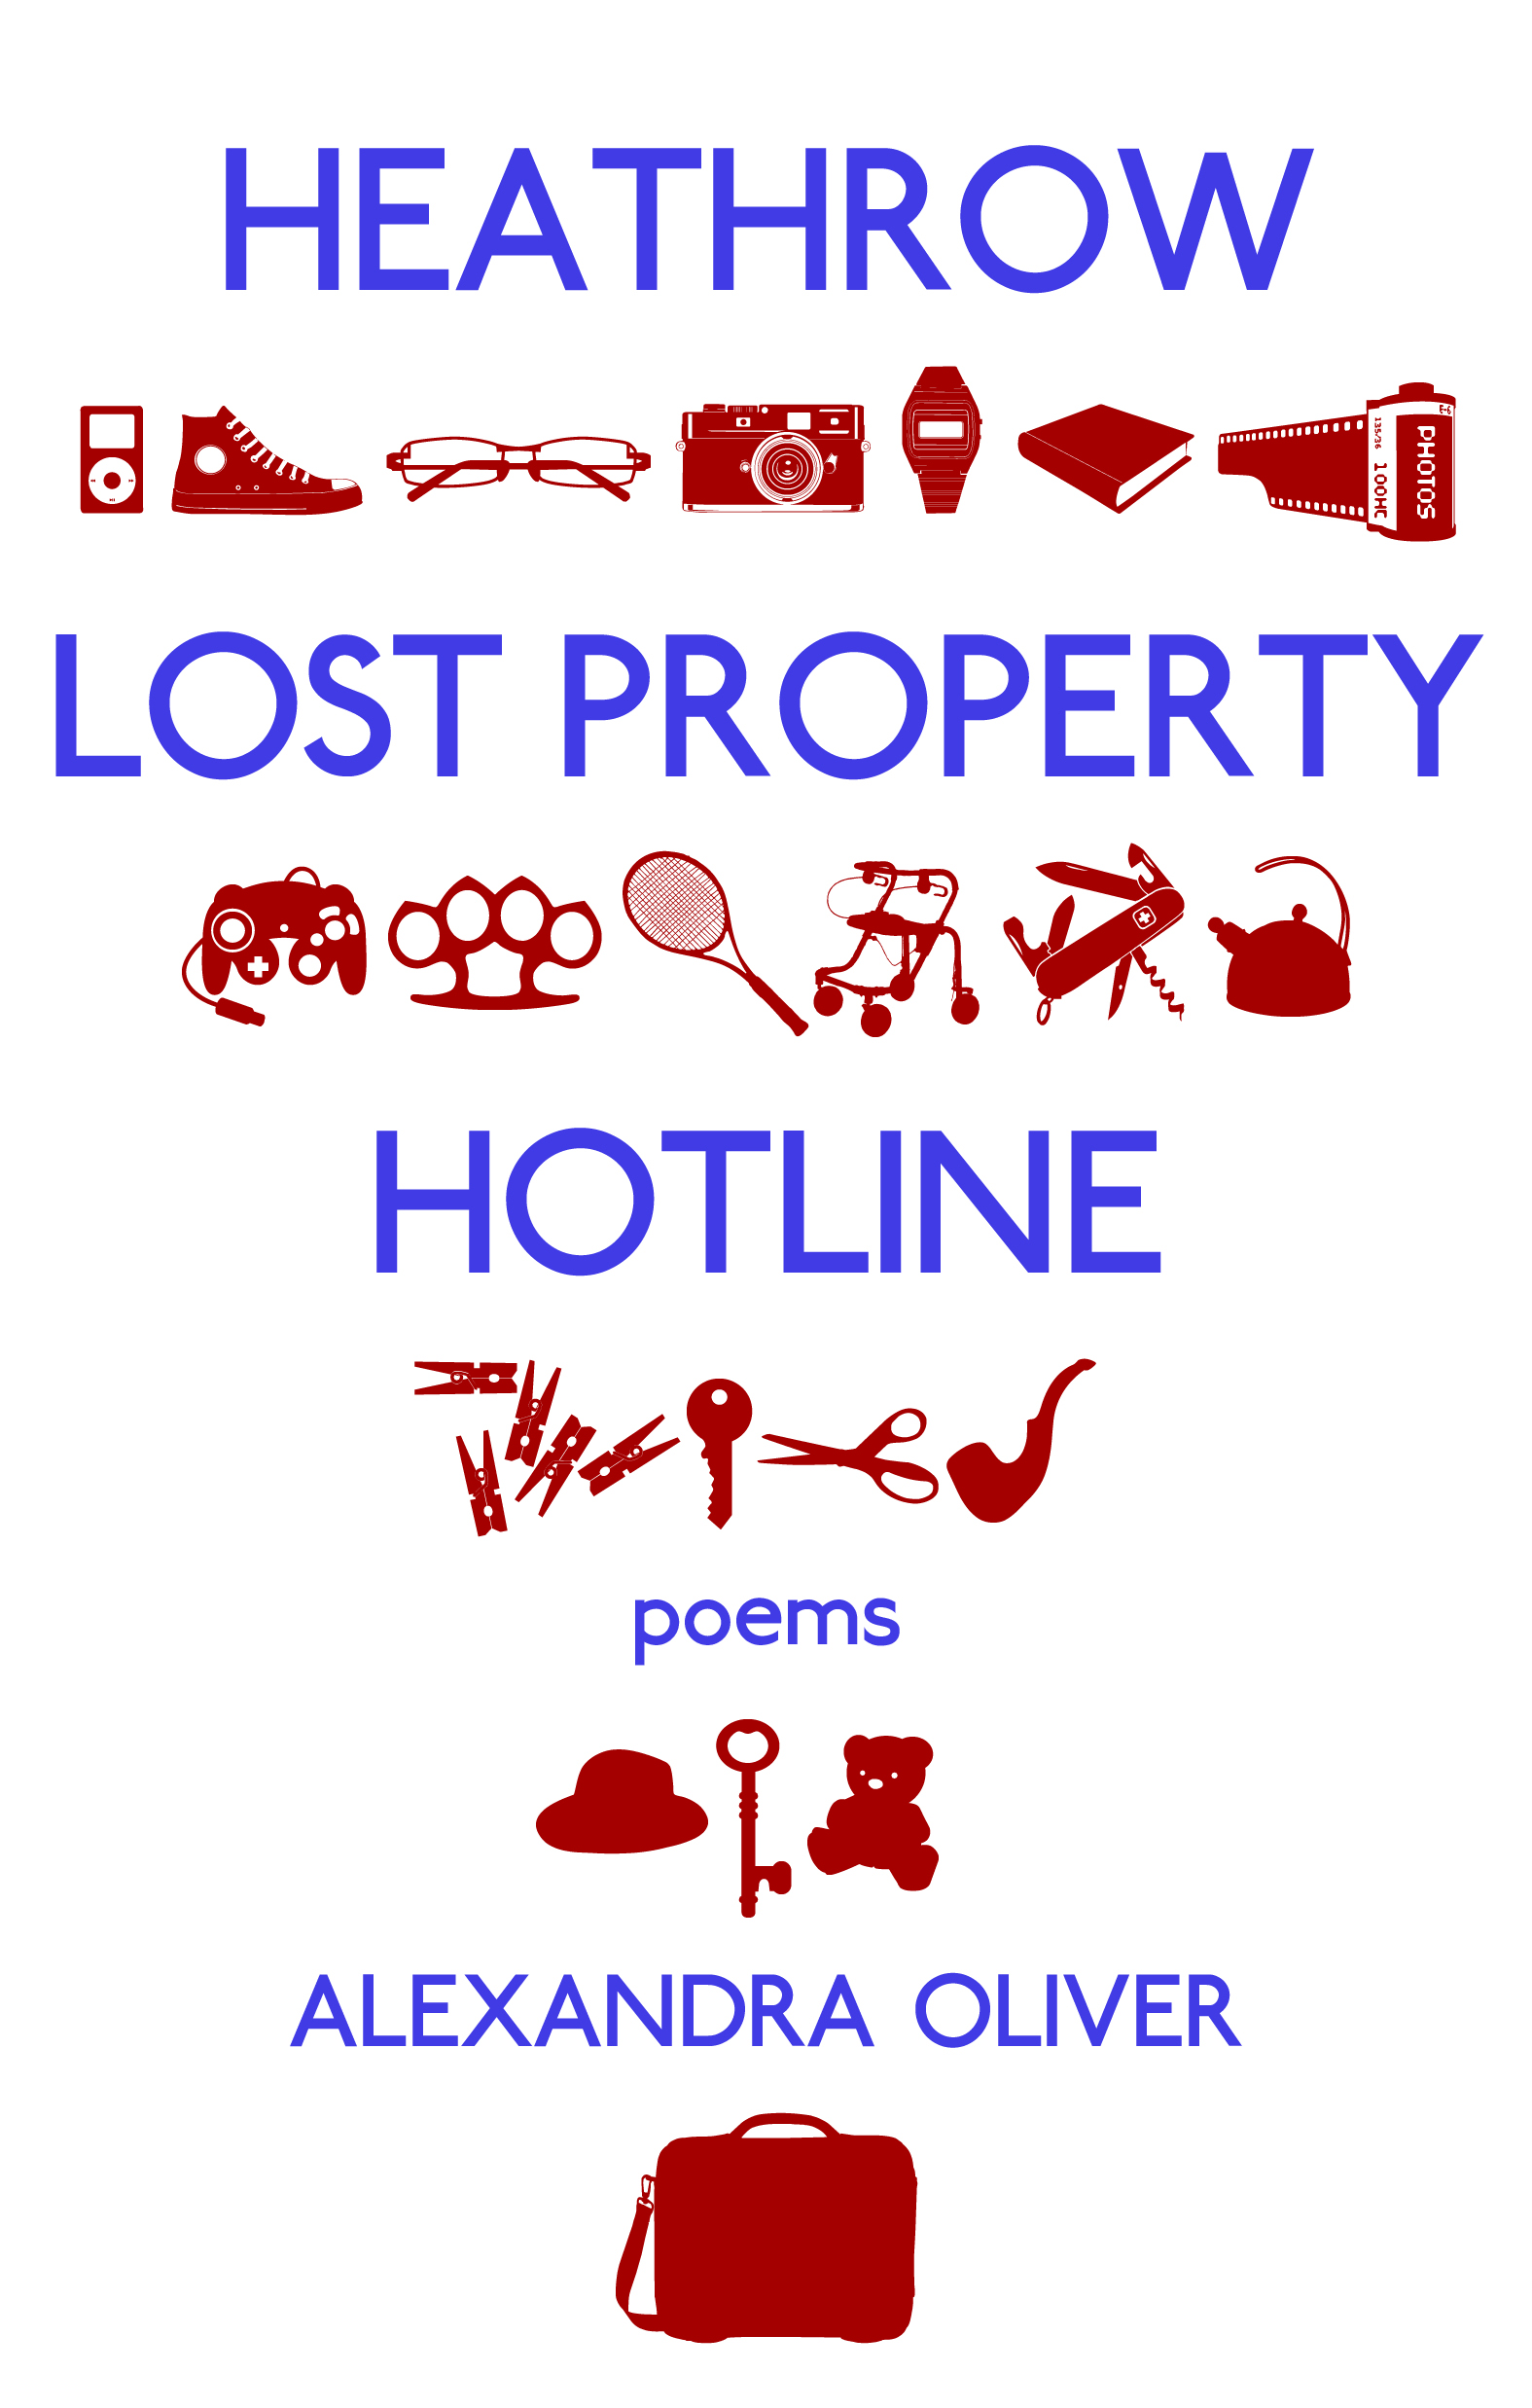 Heathrow Lost Property Hotline